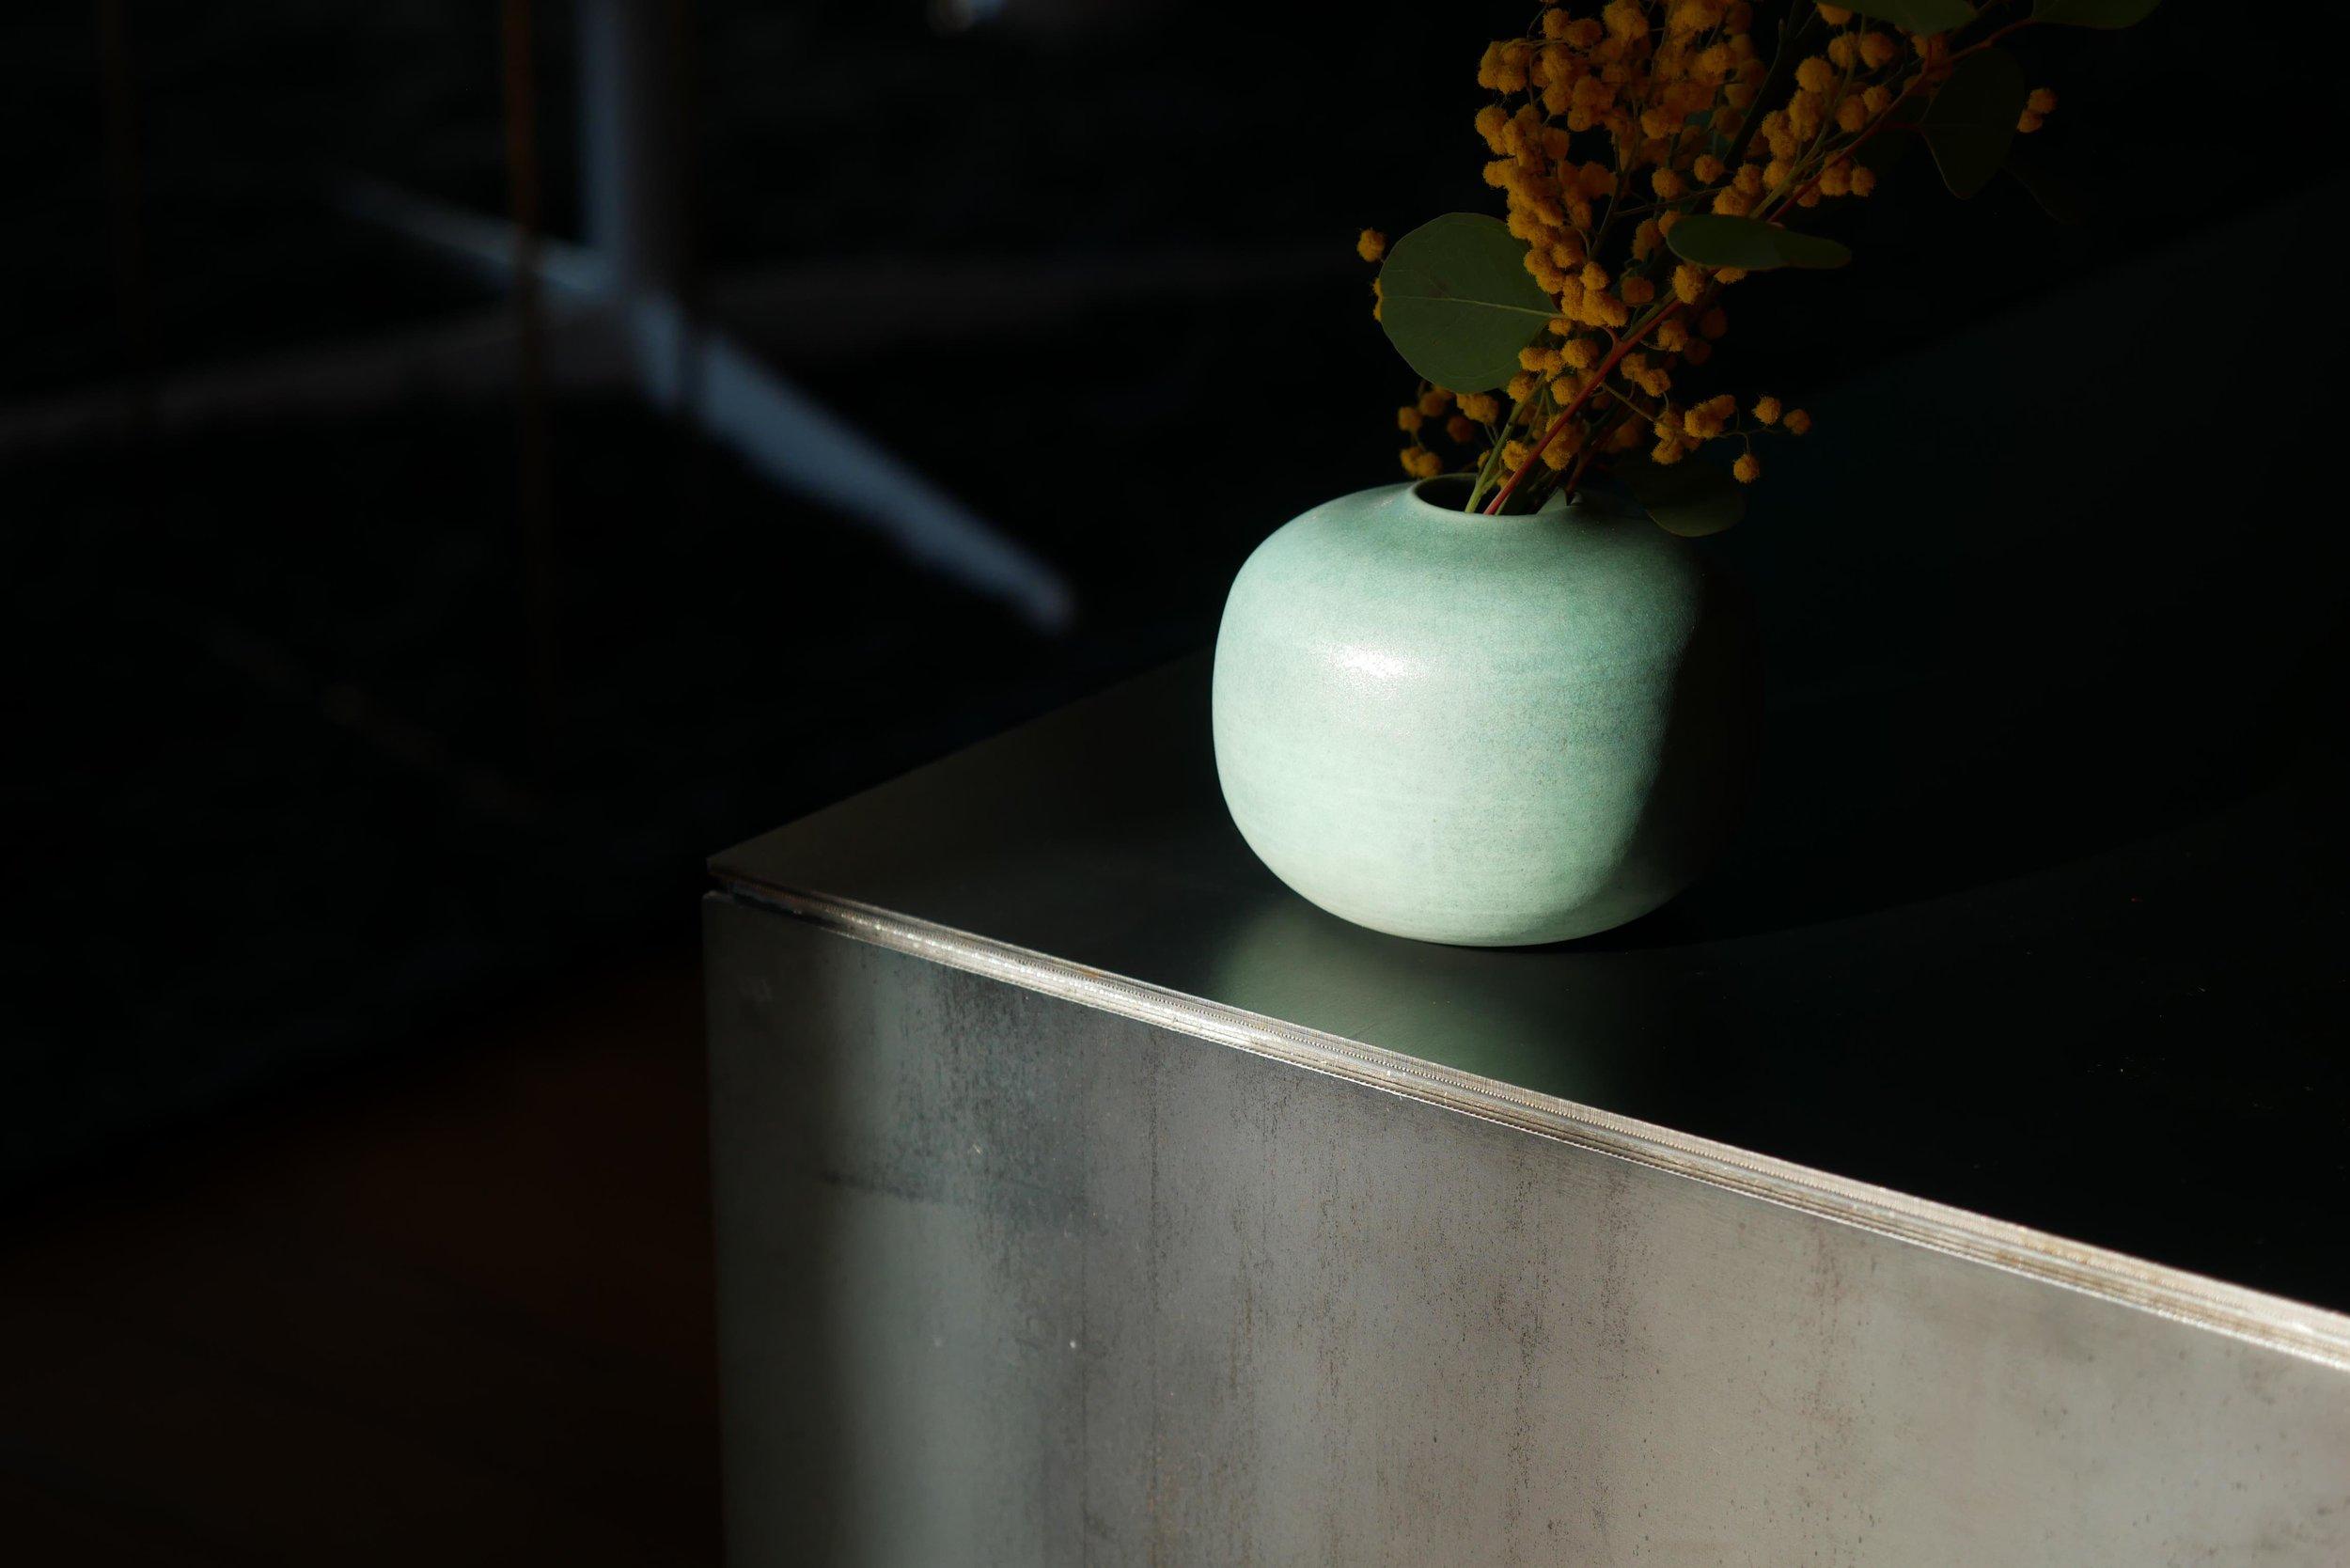 hap_ceramics_Keramik_Düsseldorf_Maxi Hoffmann_Vase_Green_Grün.jpg